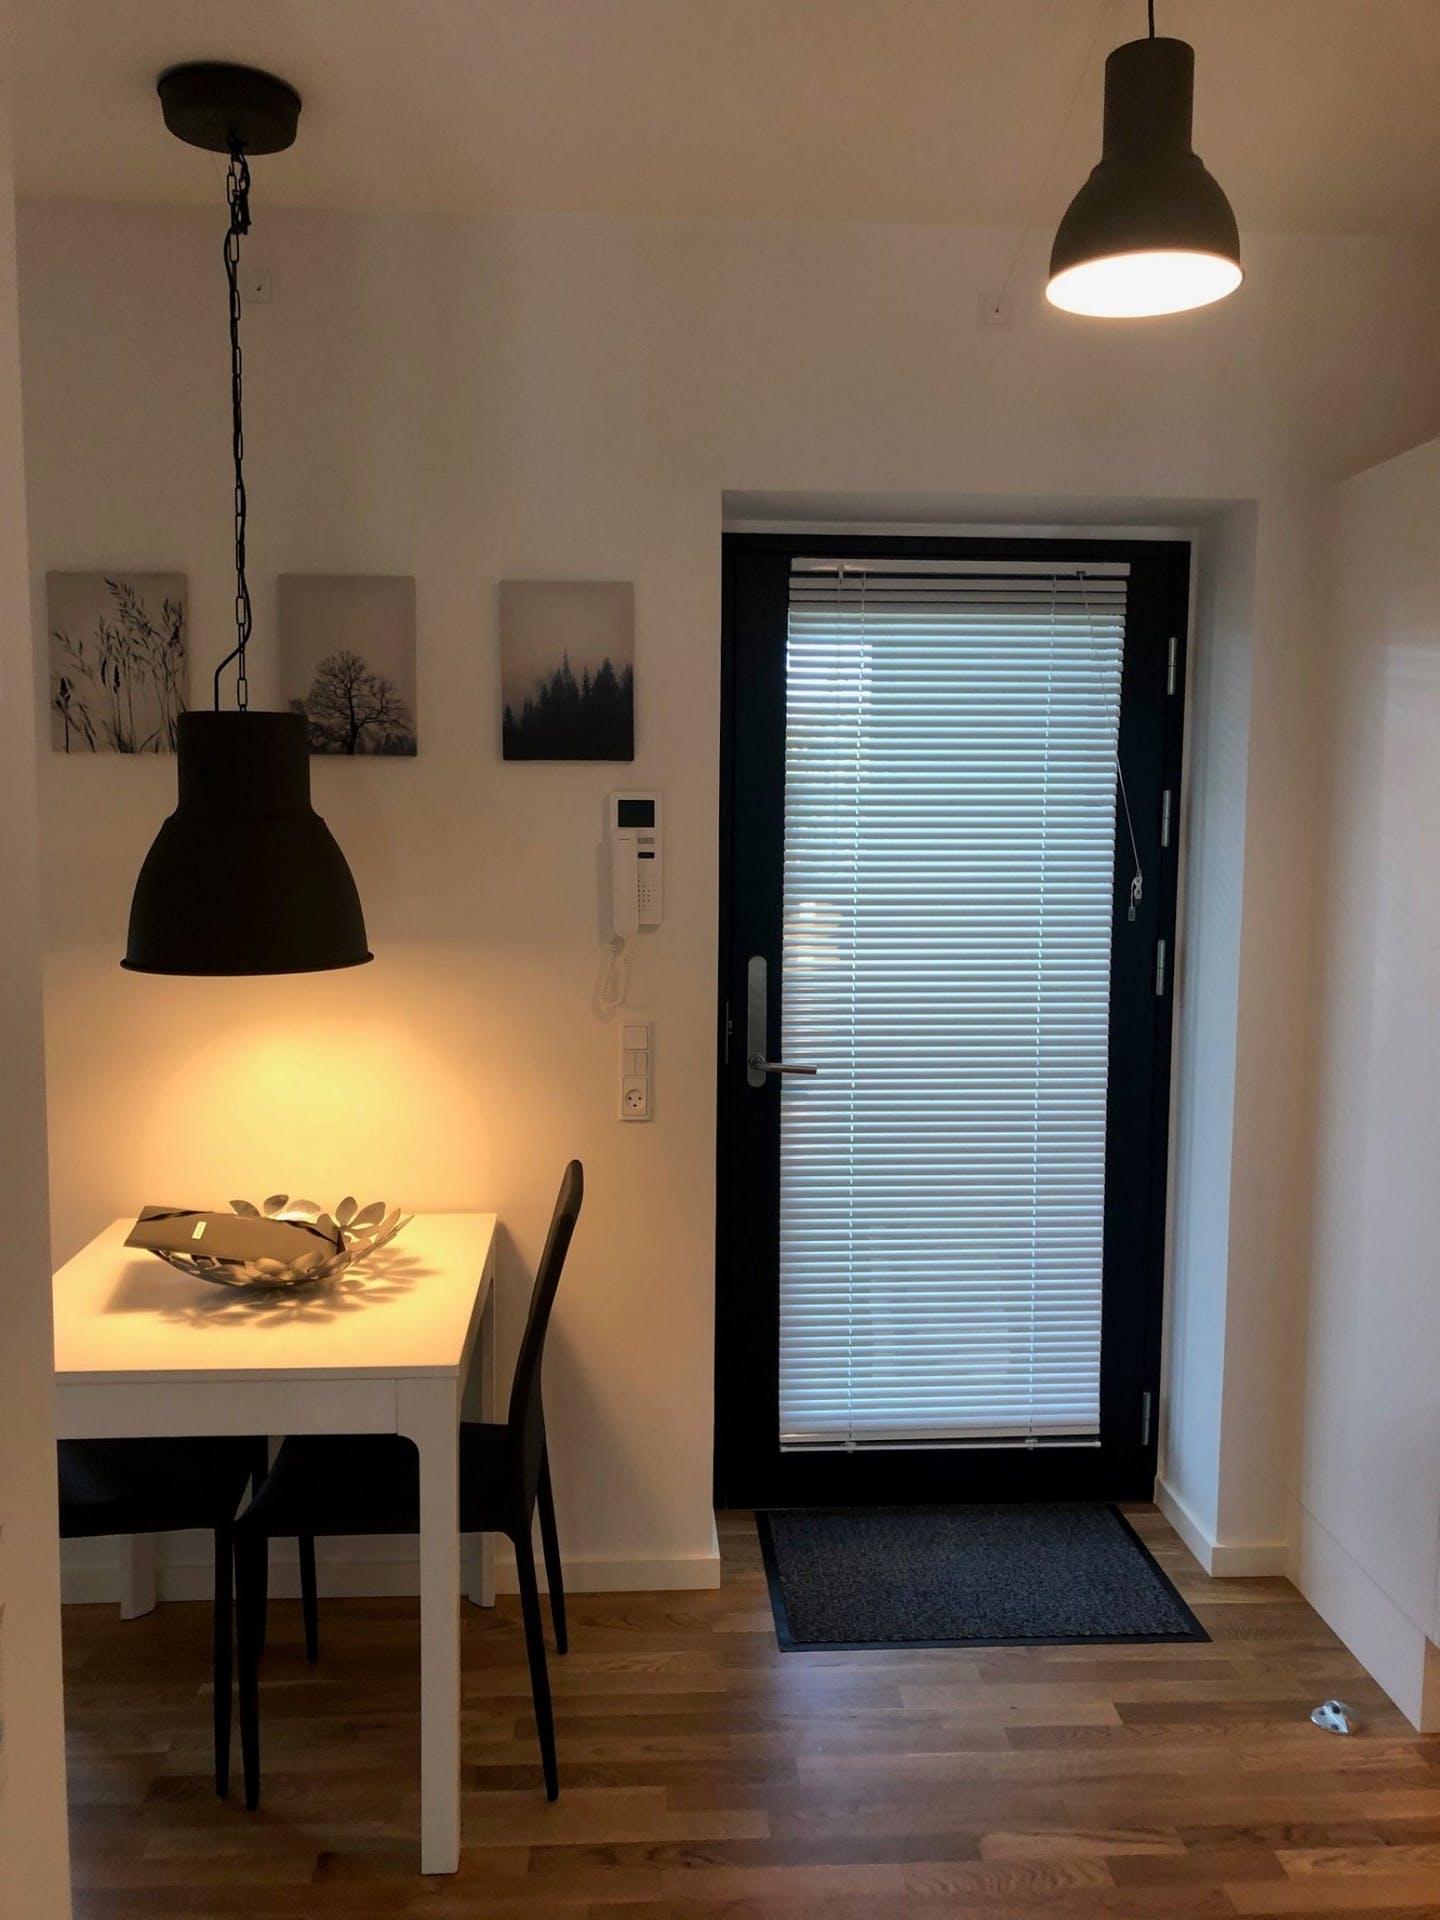 Table at Møllehatten 11 Apartment, Risskov, Aarhus